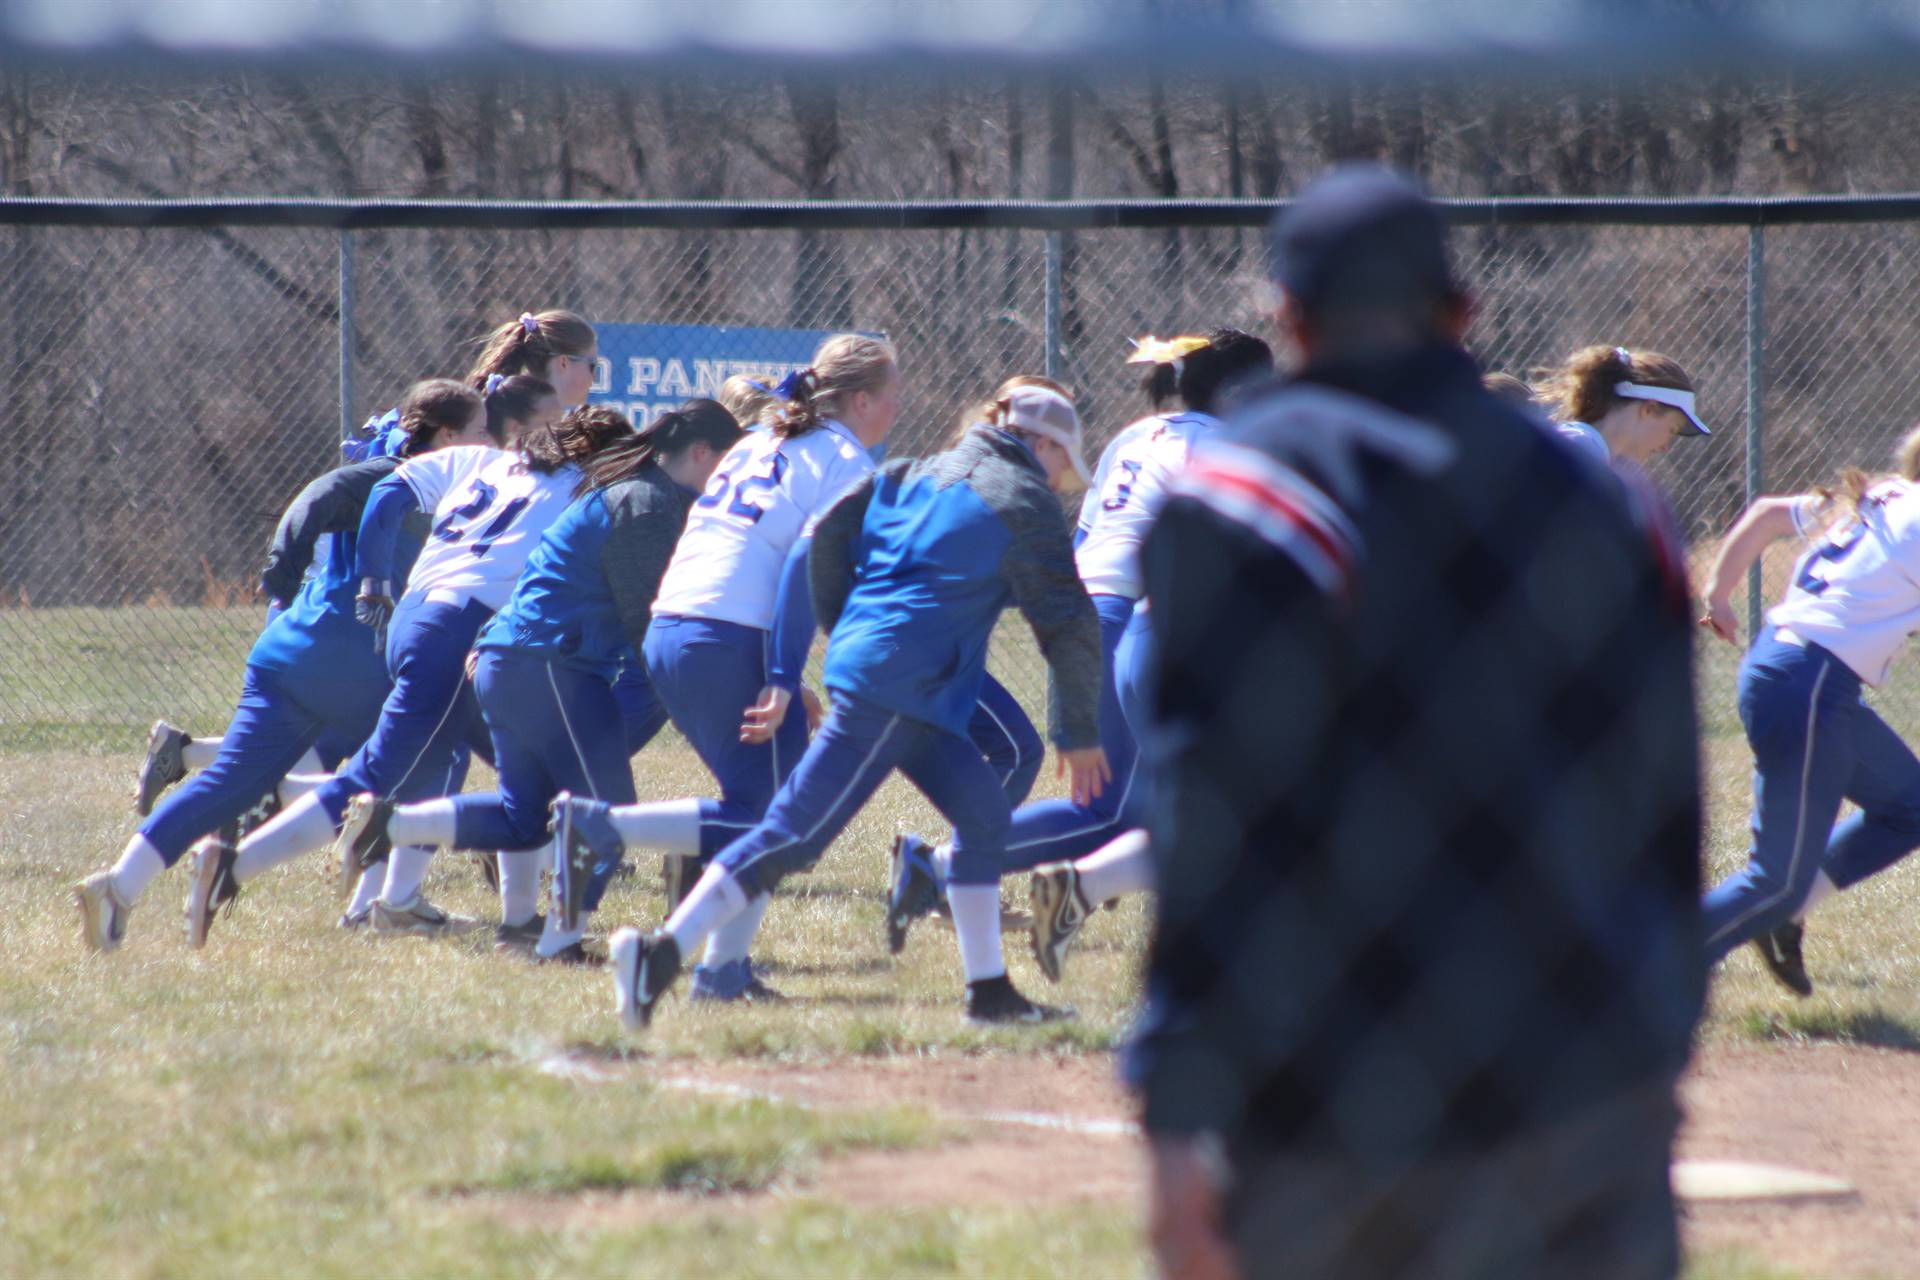 SE Softball vs West Union